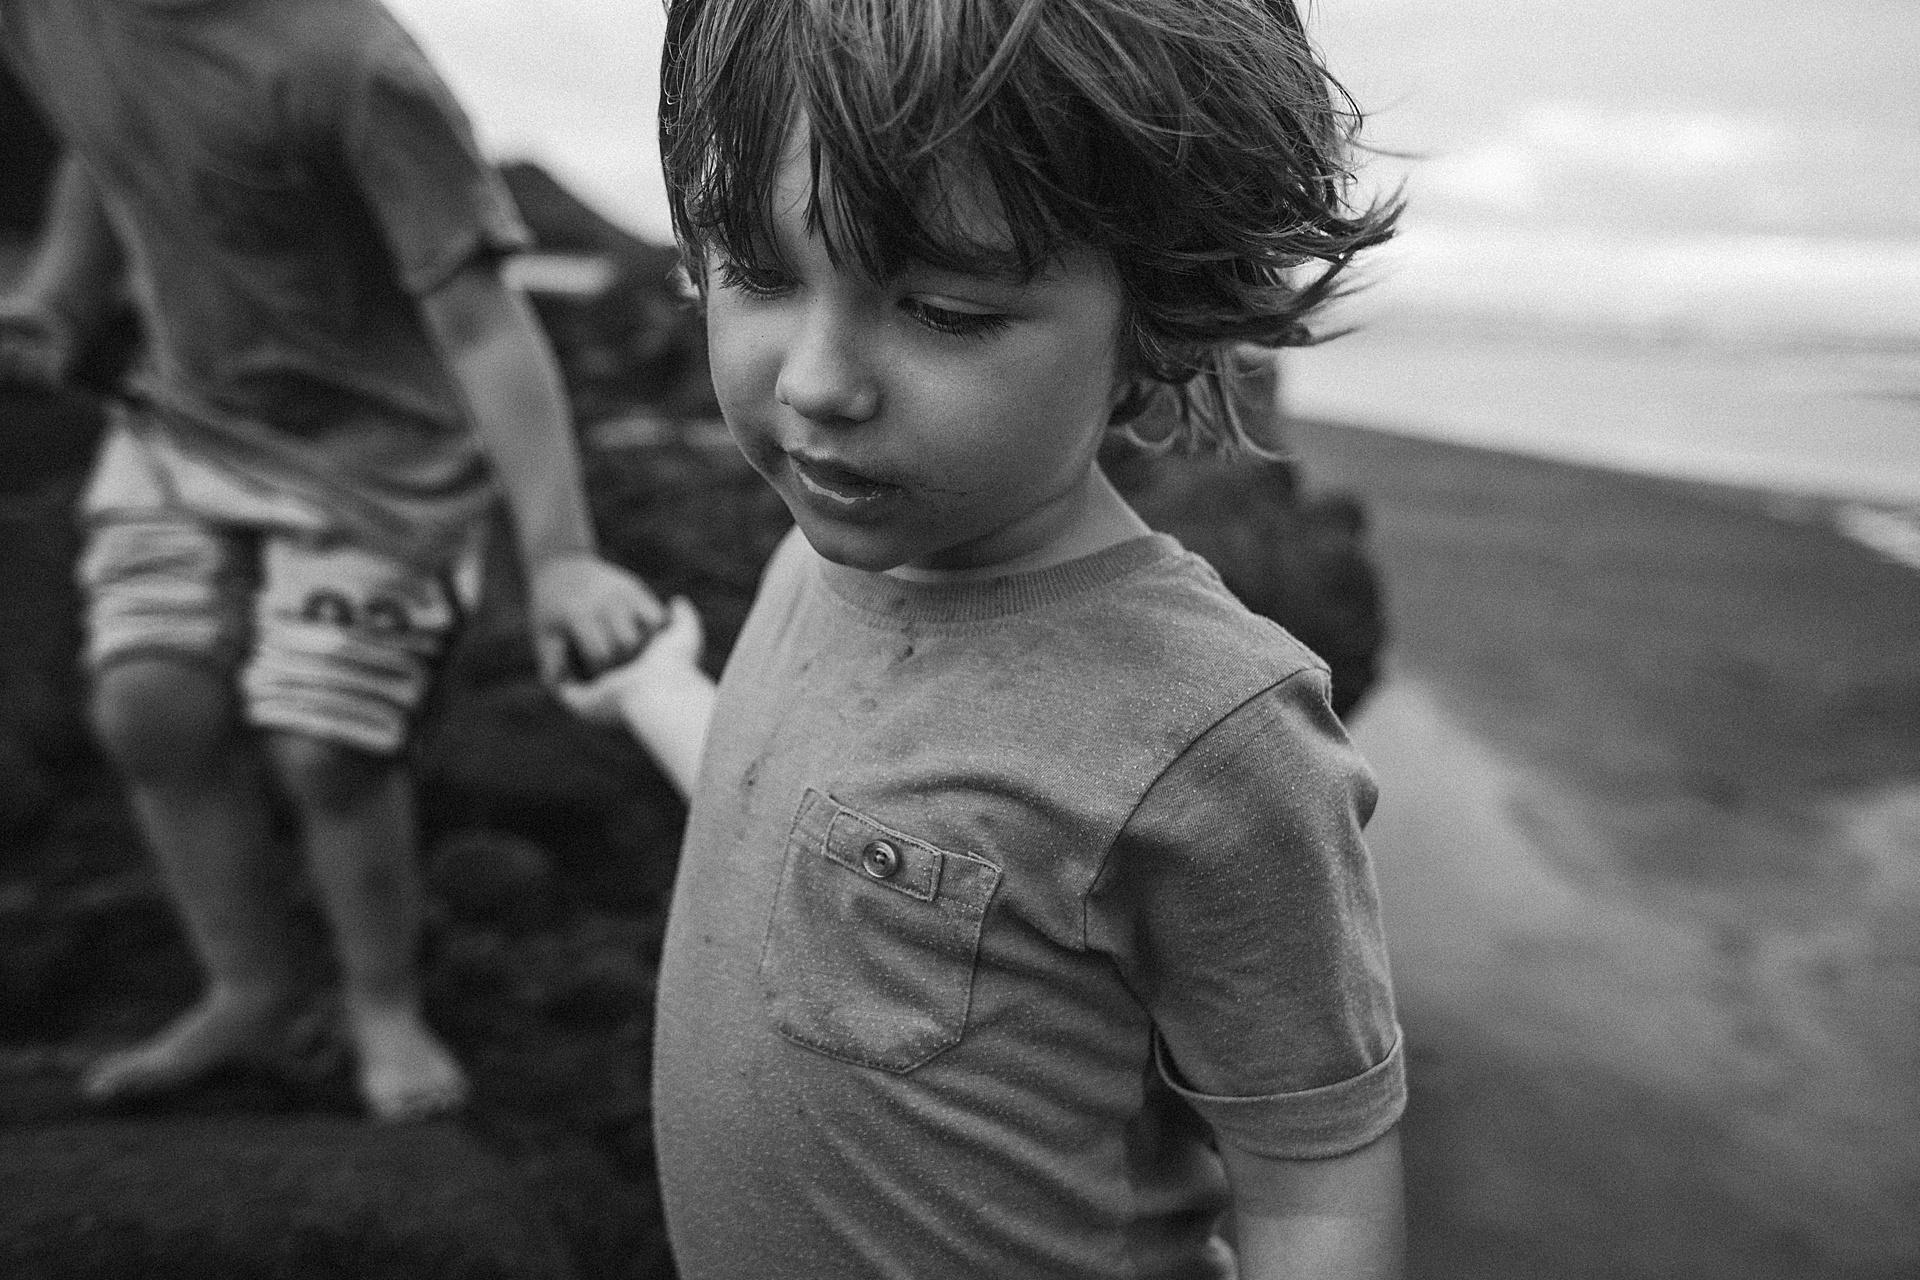 family-roadtrip-neuseeland-travelnewzealand-danielzube_0693.jpg